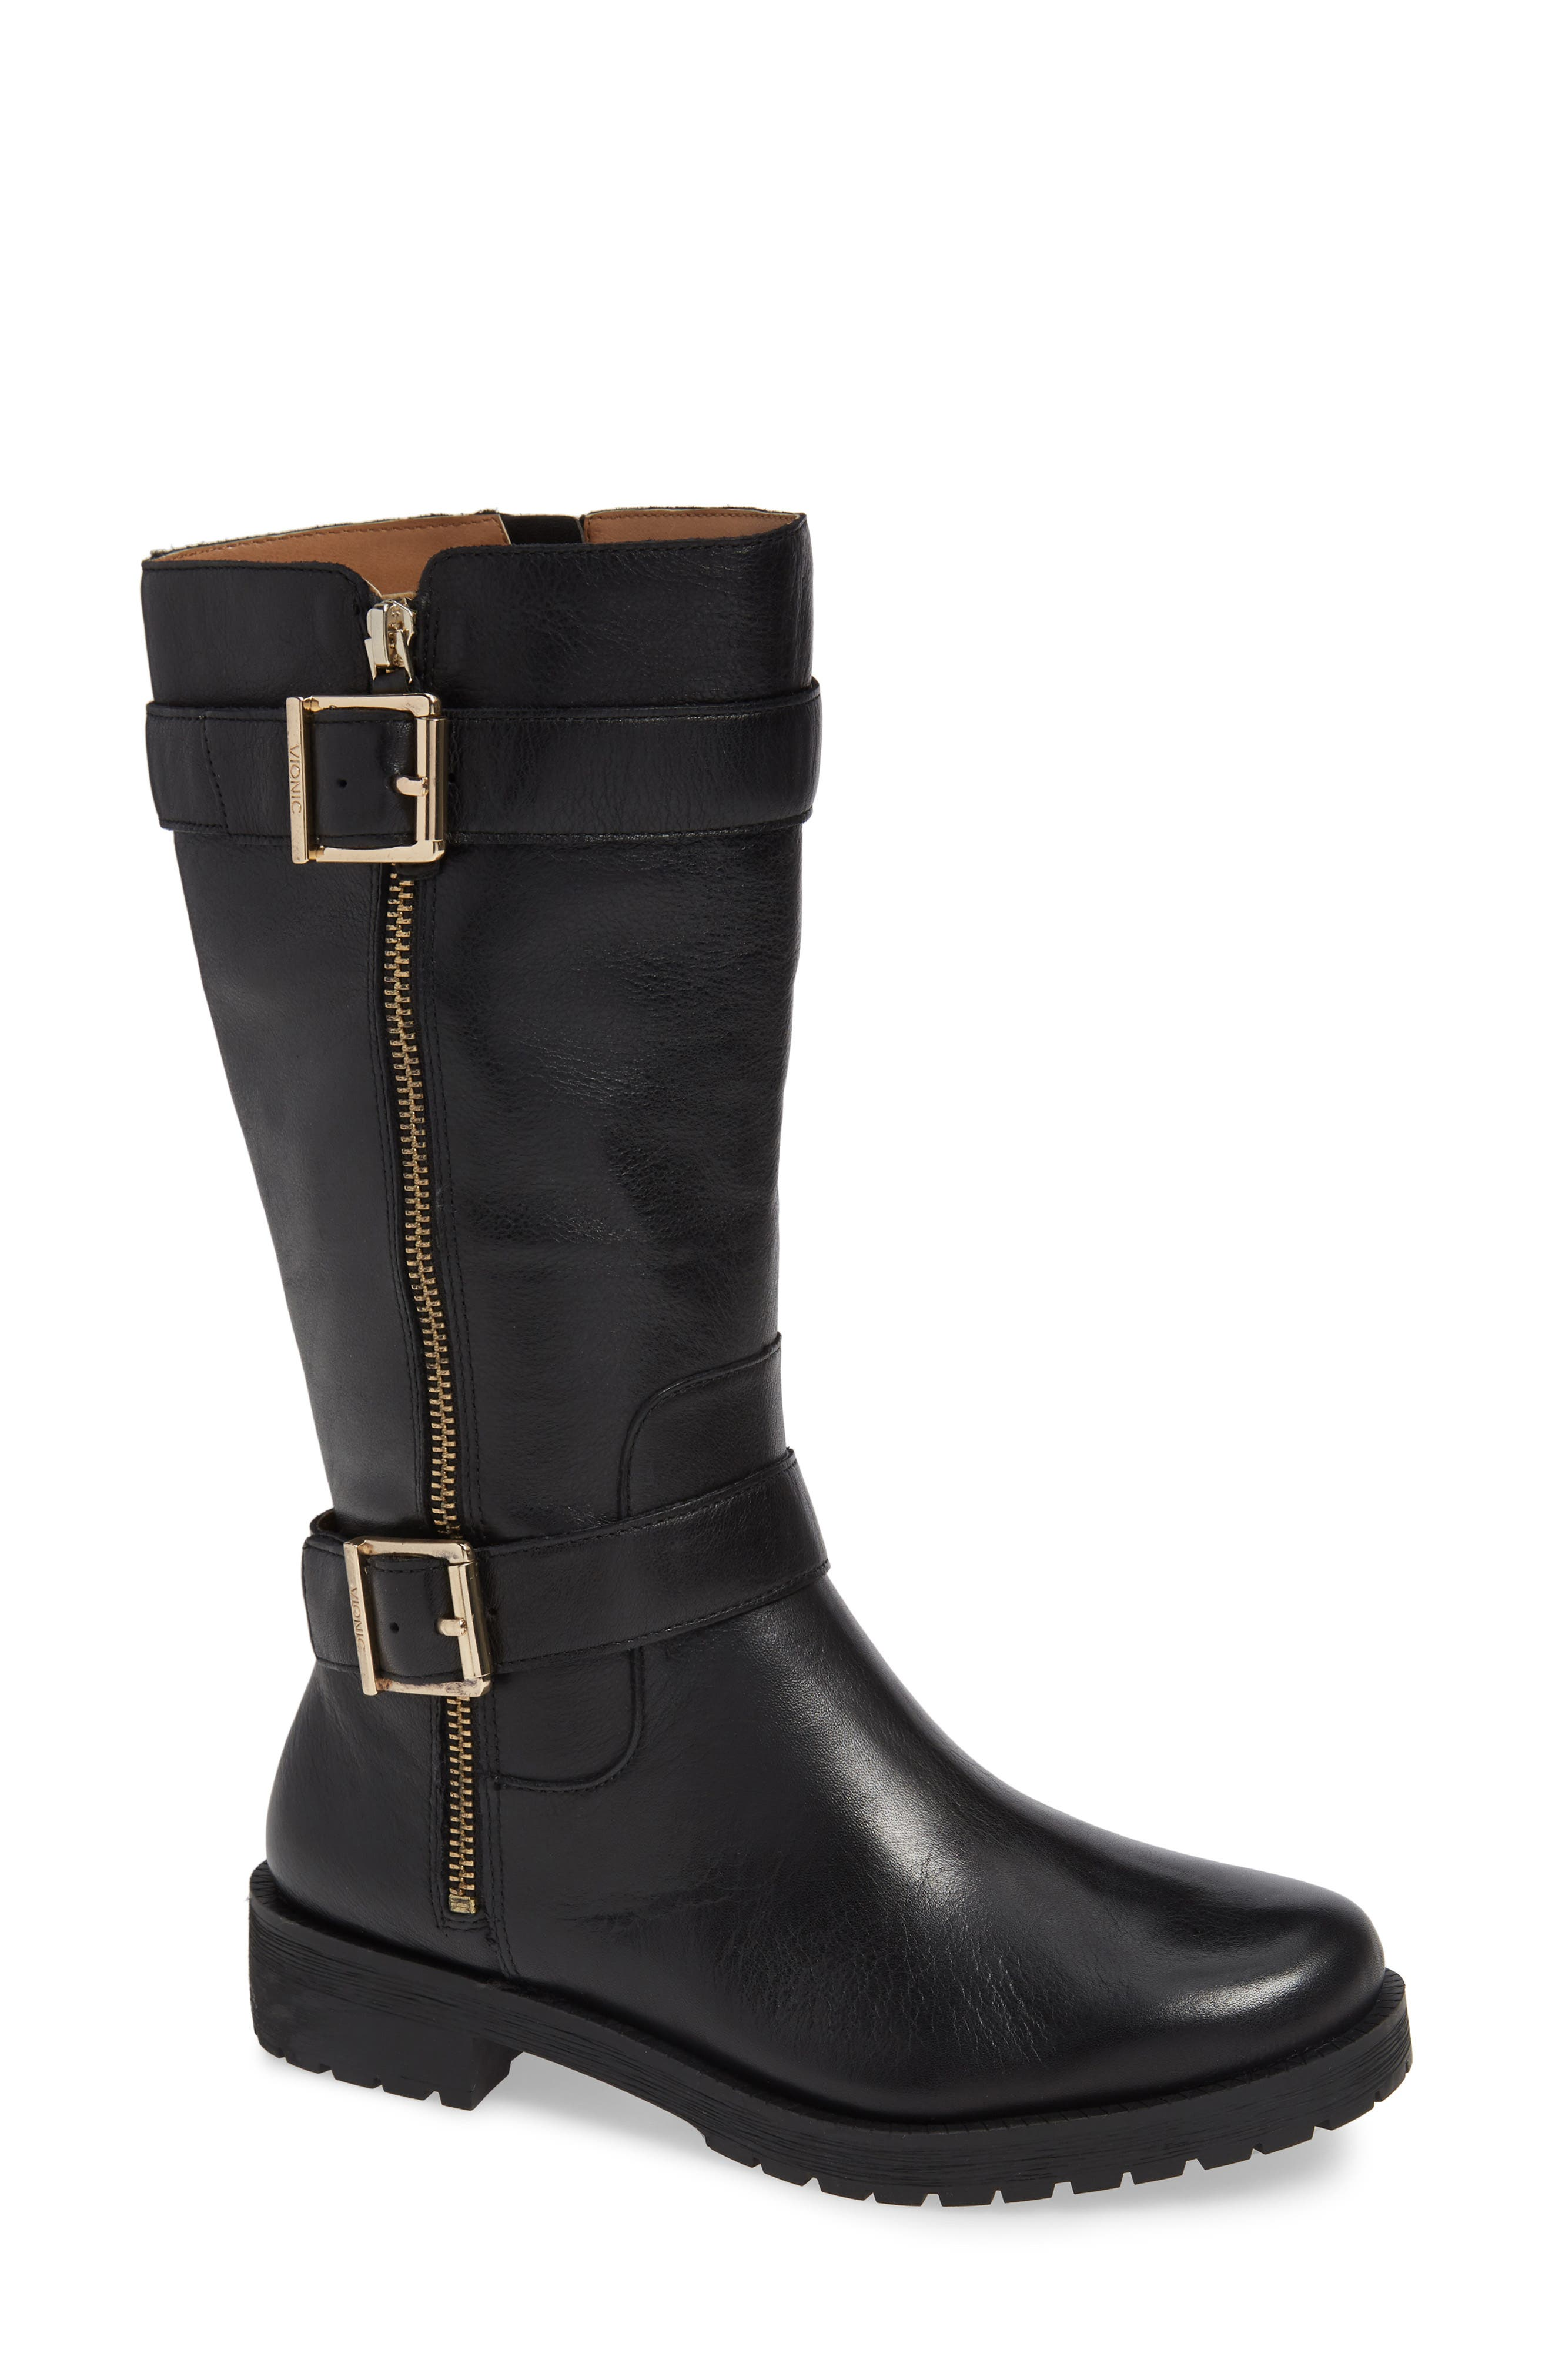 Vionic Marlow Boot, Black